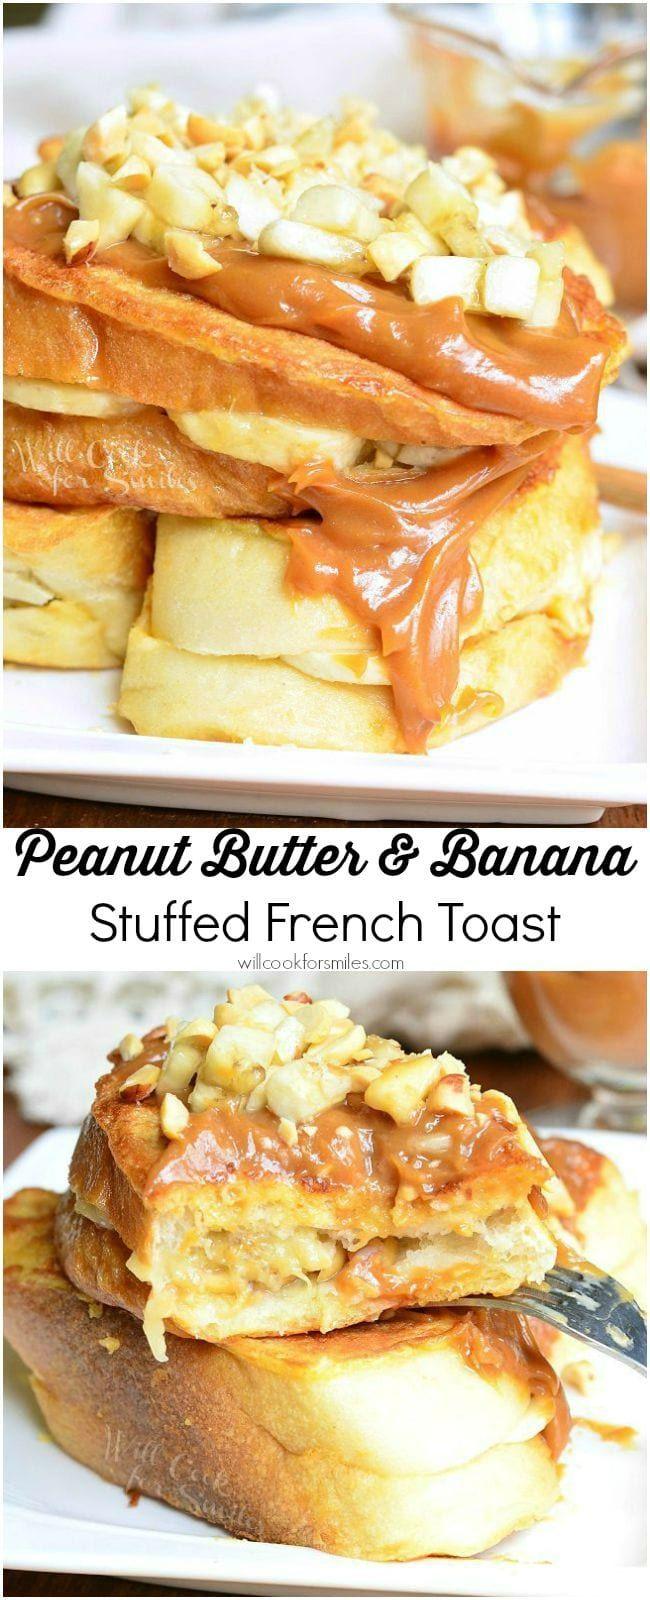 Photo of Peanut Butter Banana Stuffed French Toast